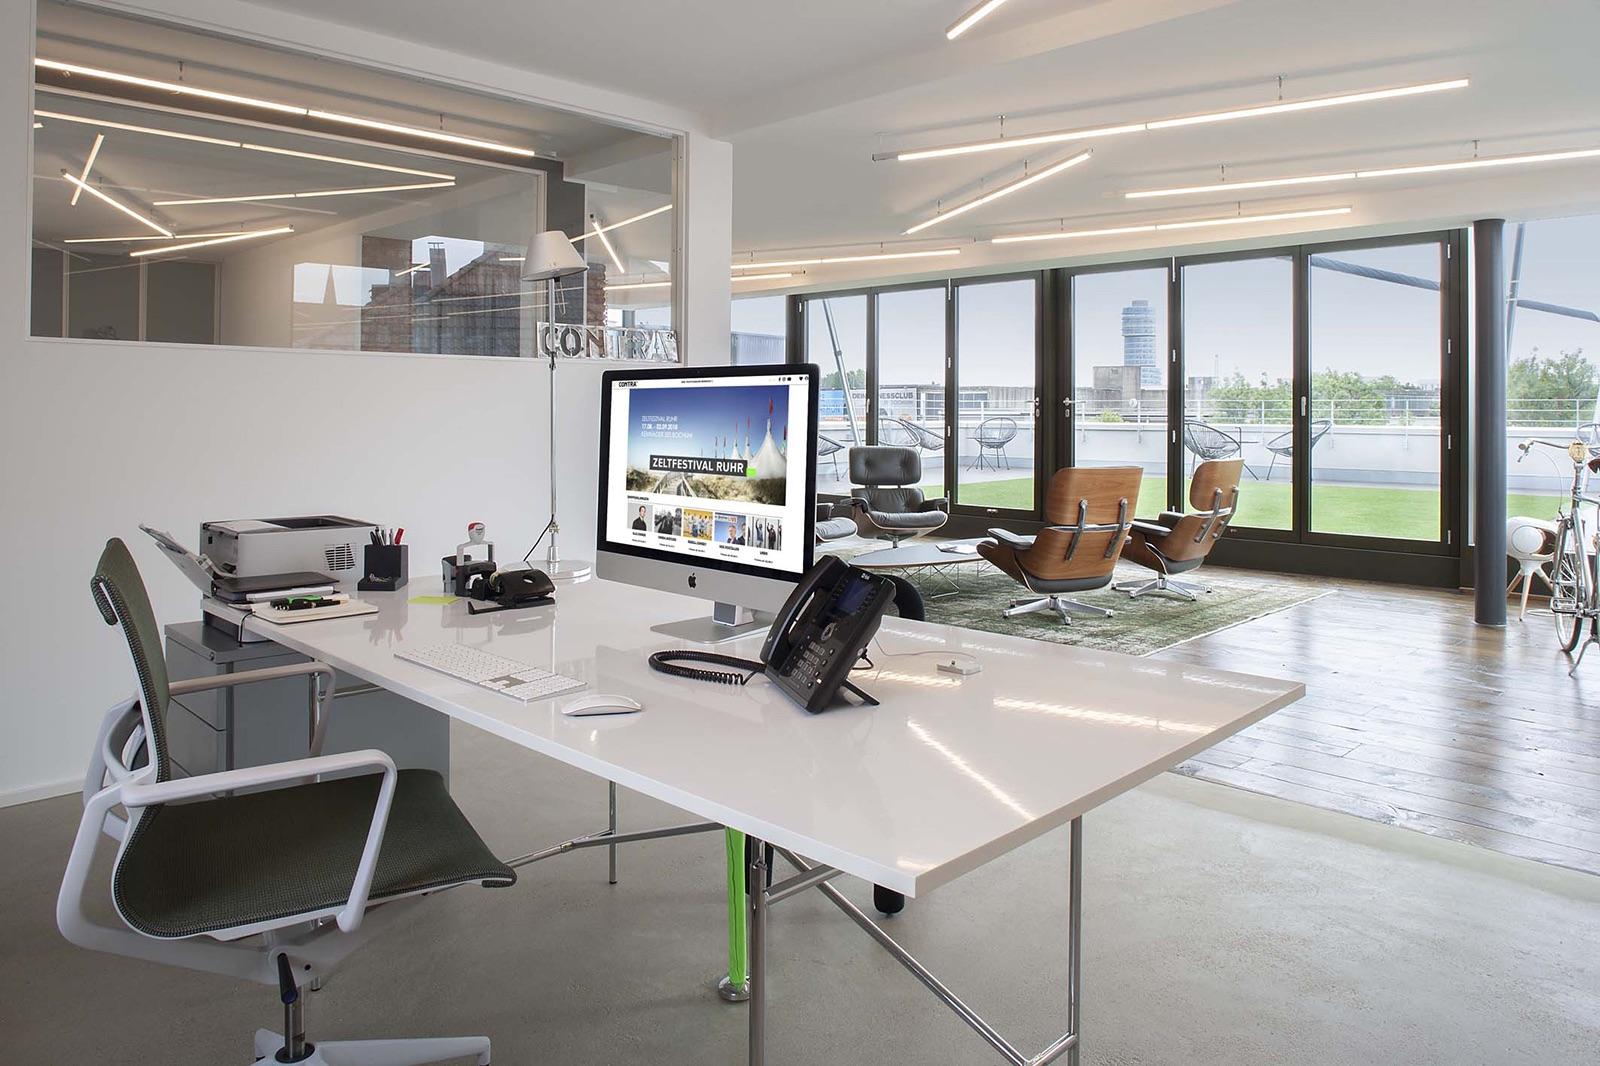 contra-bochum-office-4